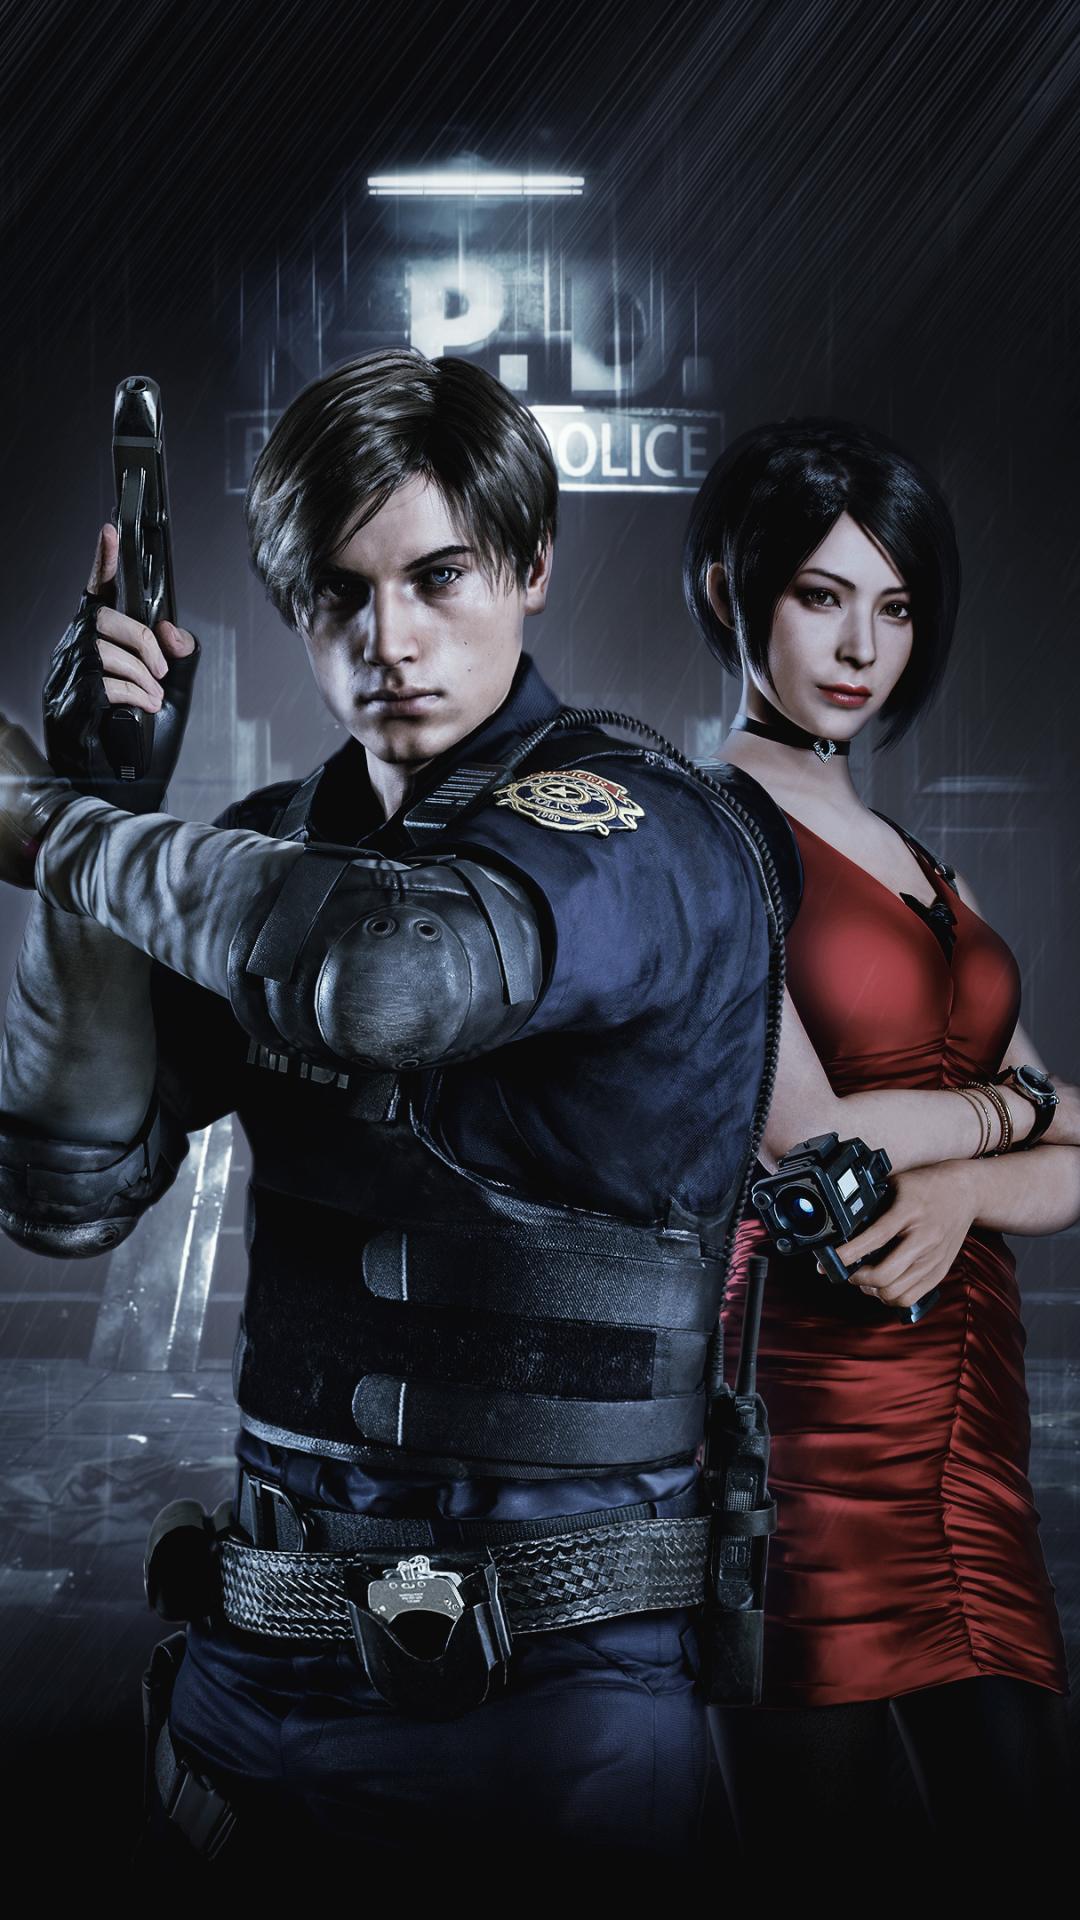 Video Game Resident Evil 2 2019 1080x1920 Wallpaper Id 830560